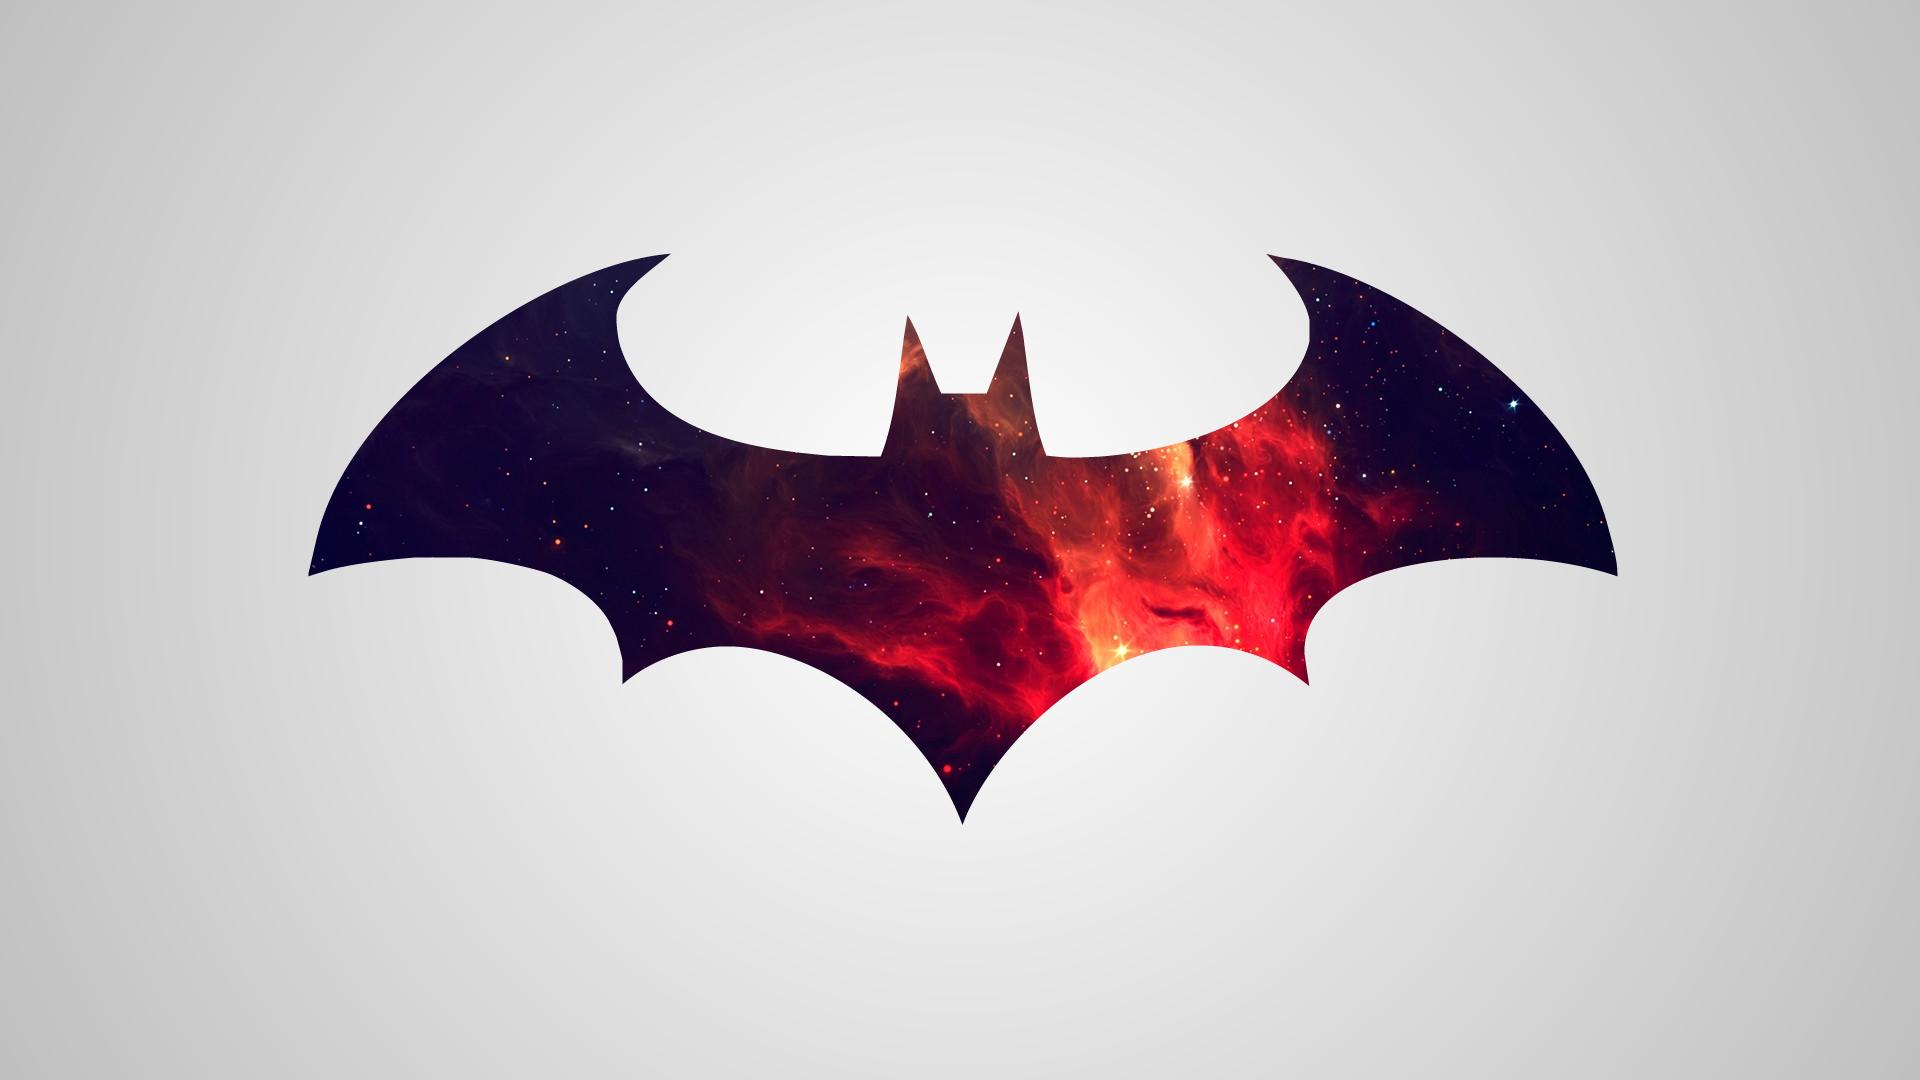 Batman Nebula Wallpaper [1920x1080] Top reddit